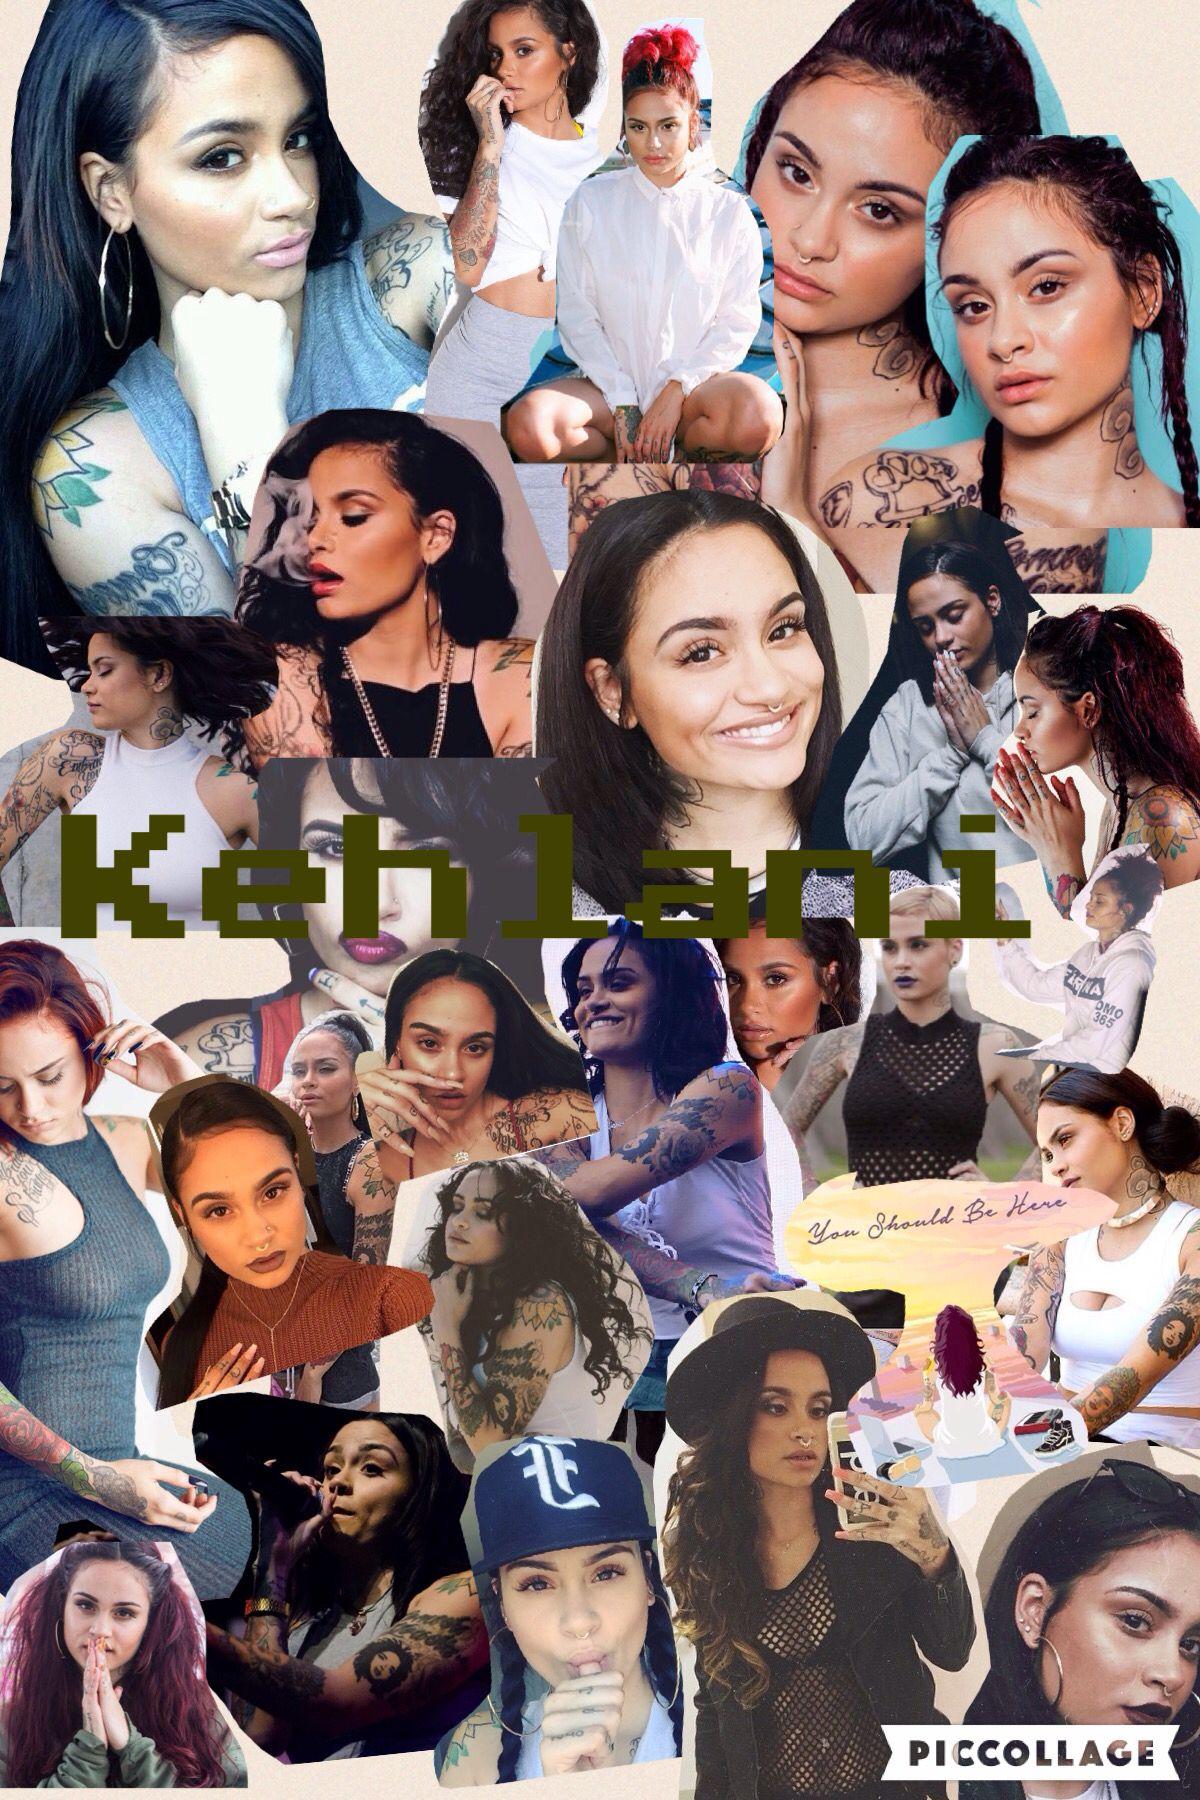 Kehlani Aesthetic Wallpapers Kehlani Photo Collage